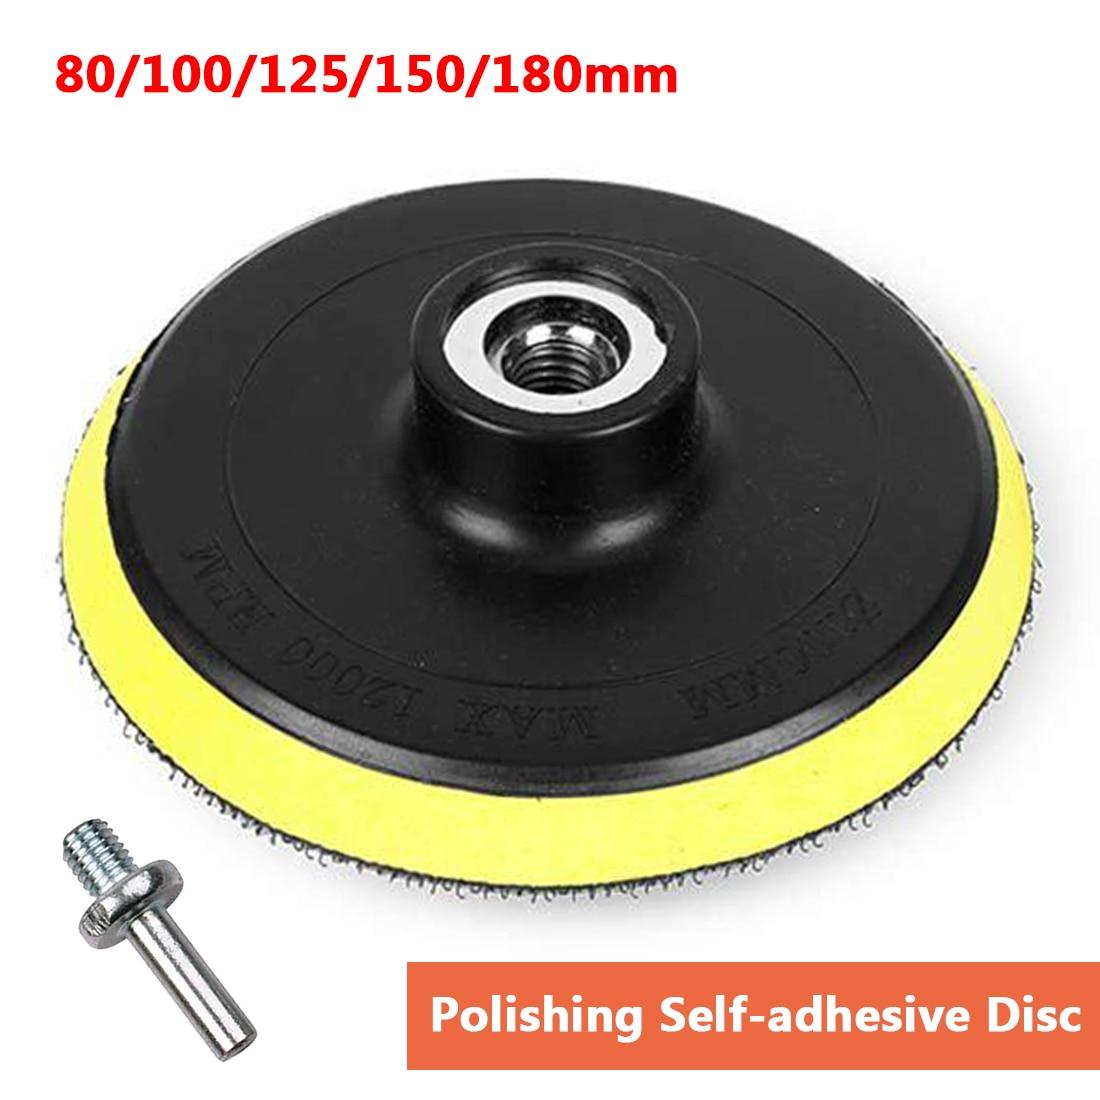 80-180mm Polishing Self-adhesive Disc Polishing Sandpaper Sheet Adhesive Disc Chuck Angle Grinder Sticky Plate for Car